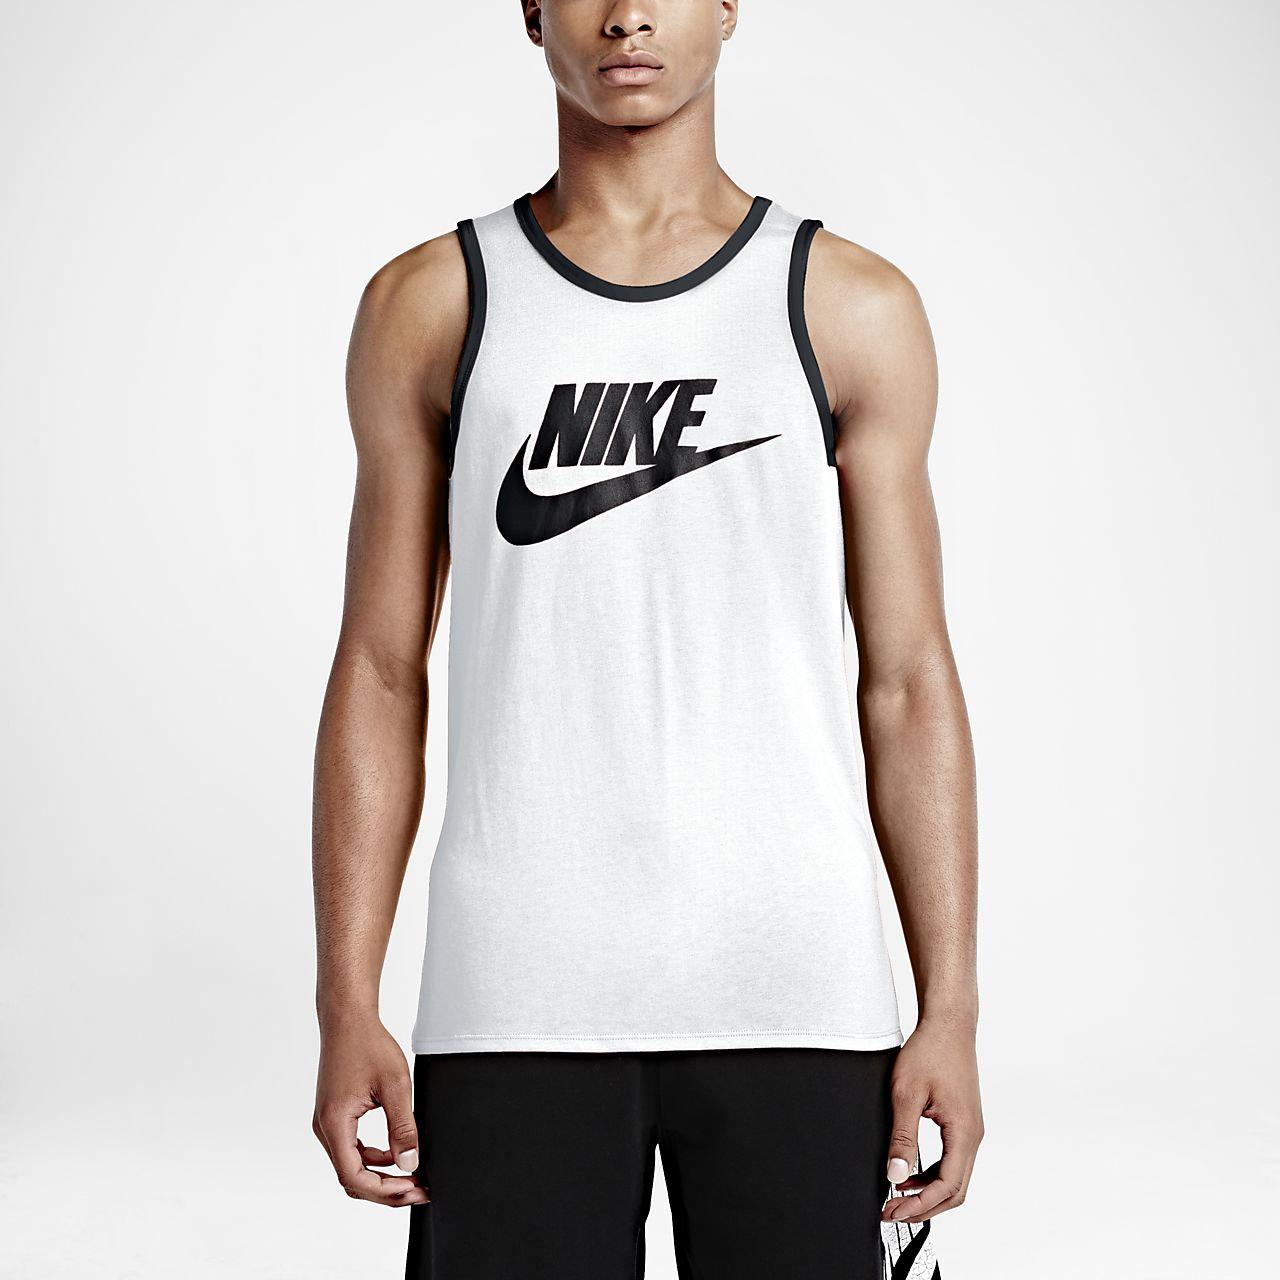 Nike Ace Logo 男子背心